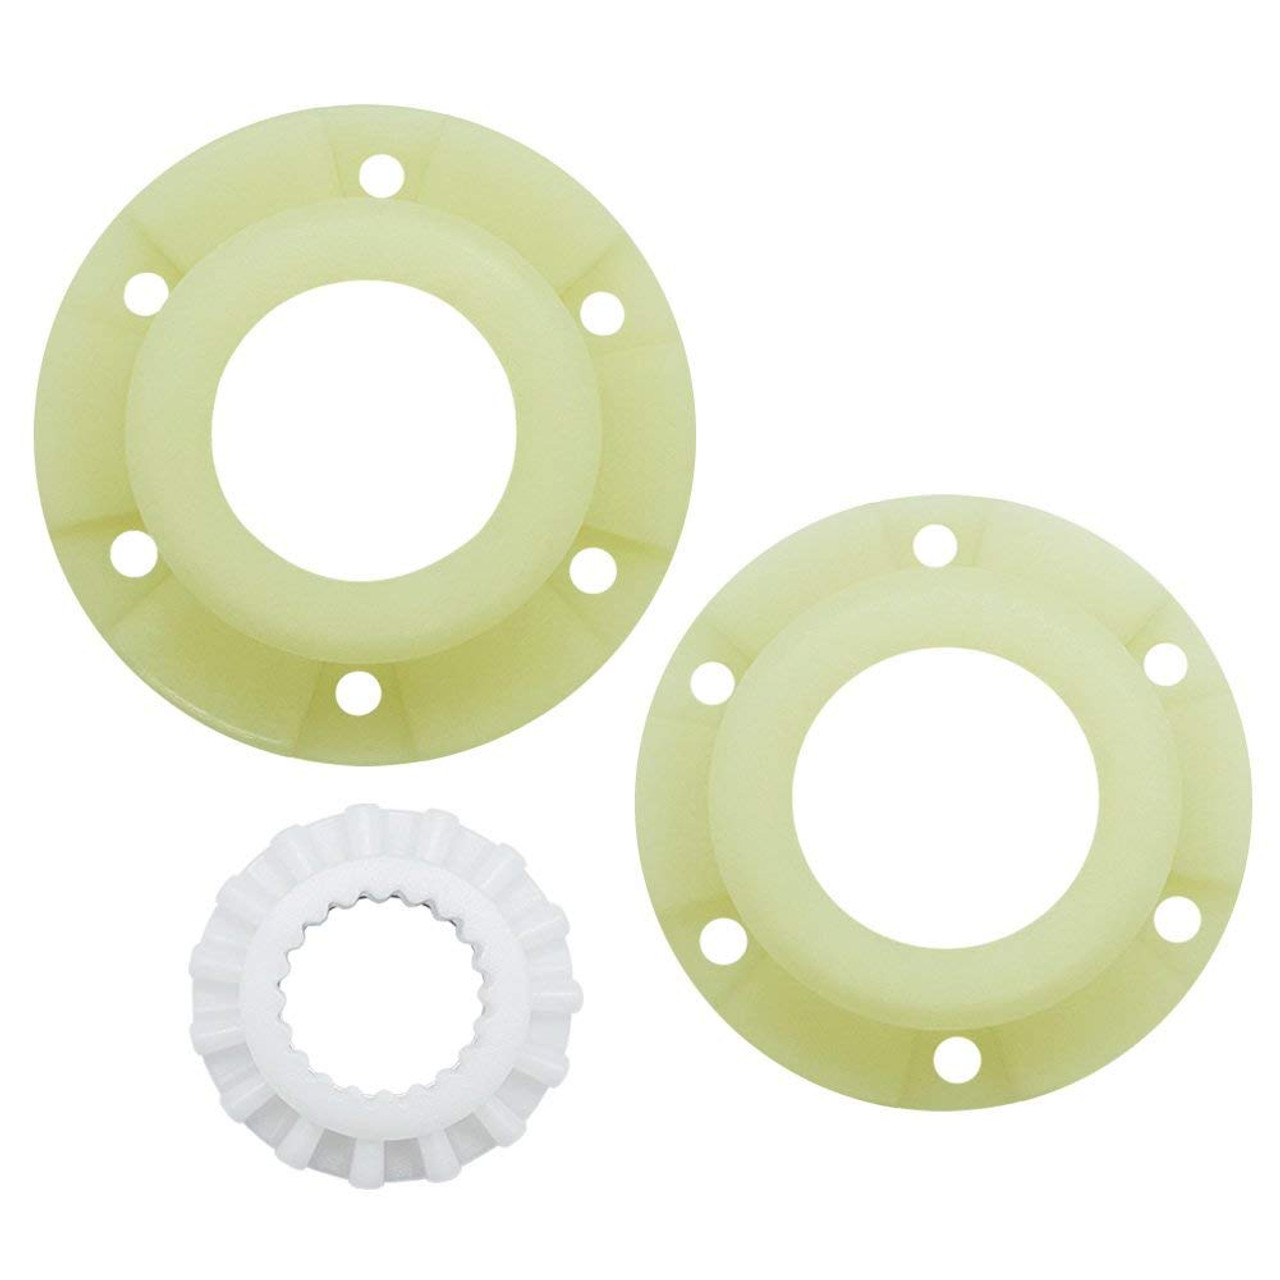 W10820039 280145 Washer Hub Kit For Whirlpool Maytag Cabrio Bravo US